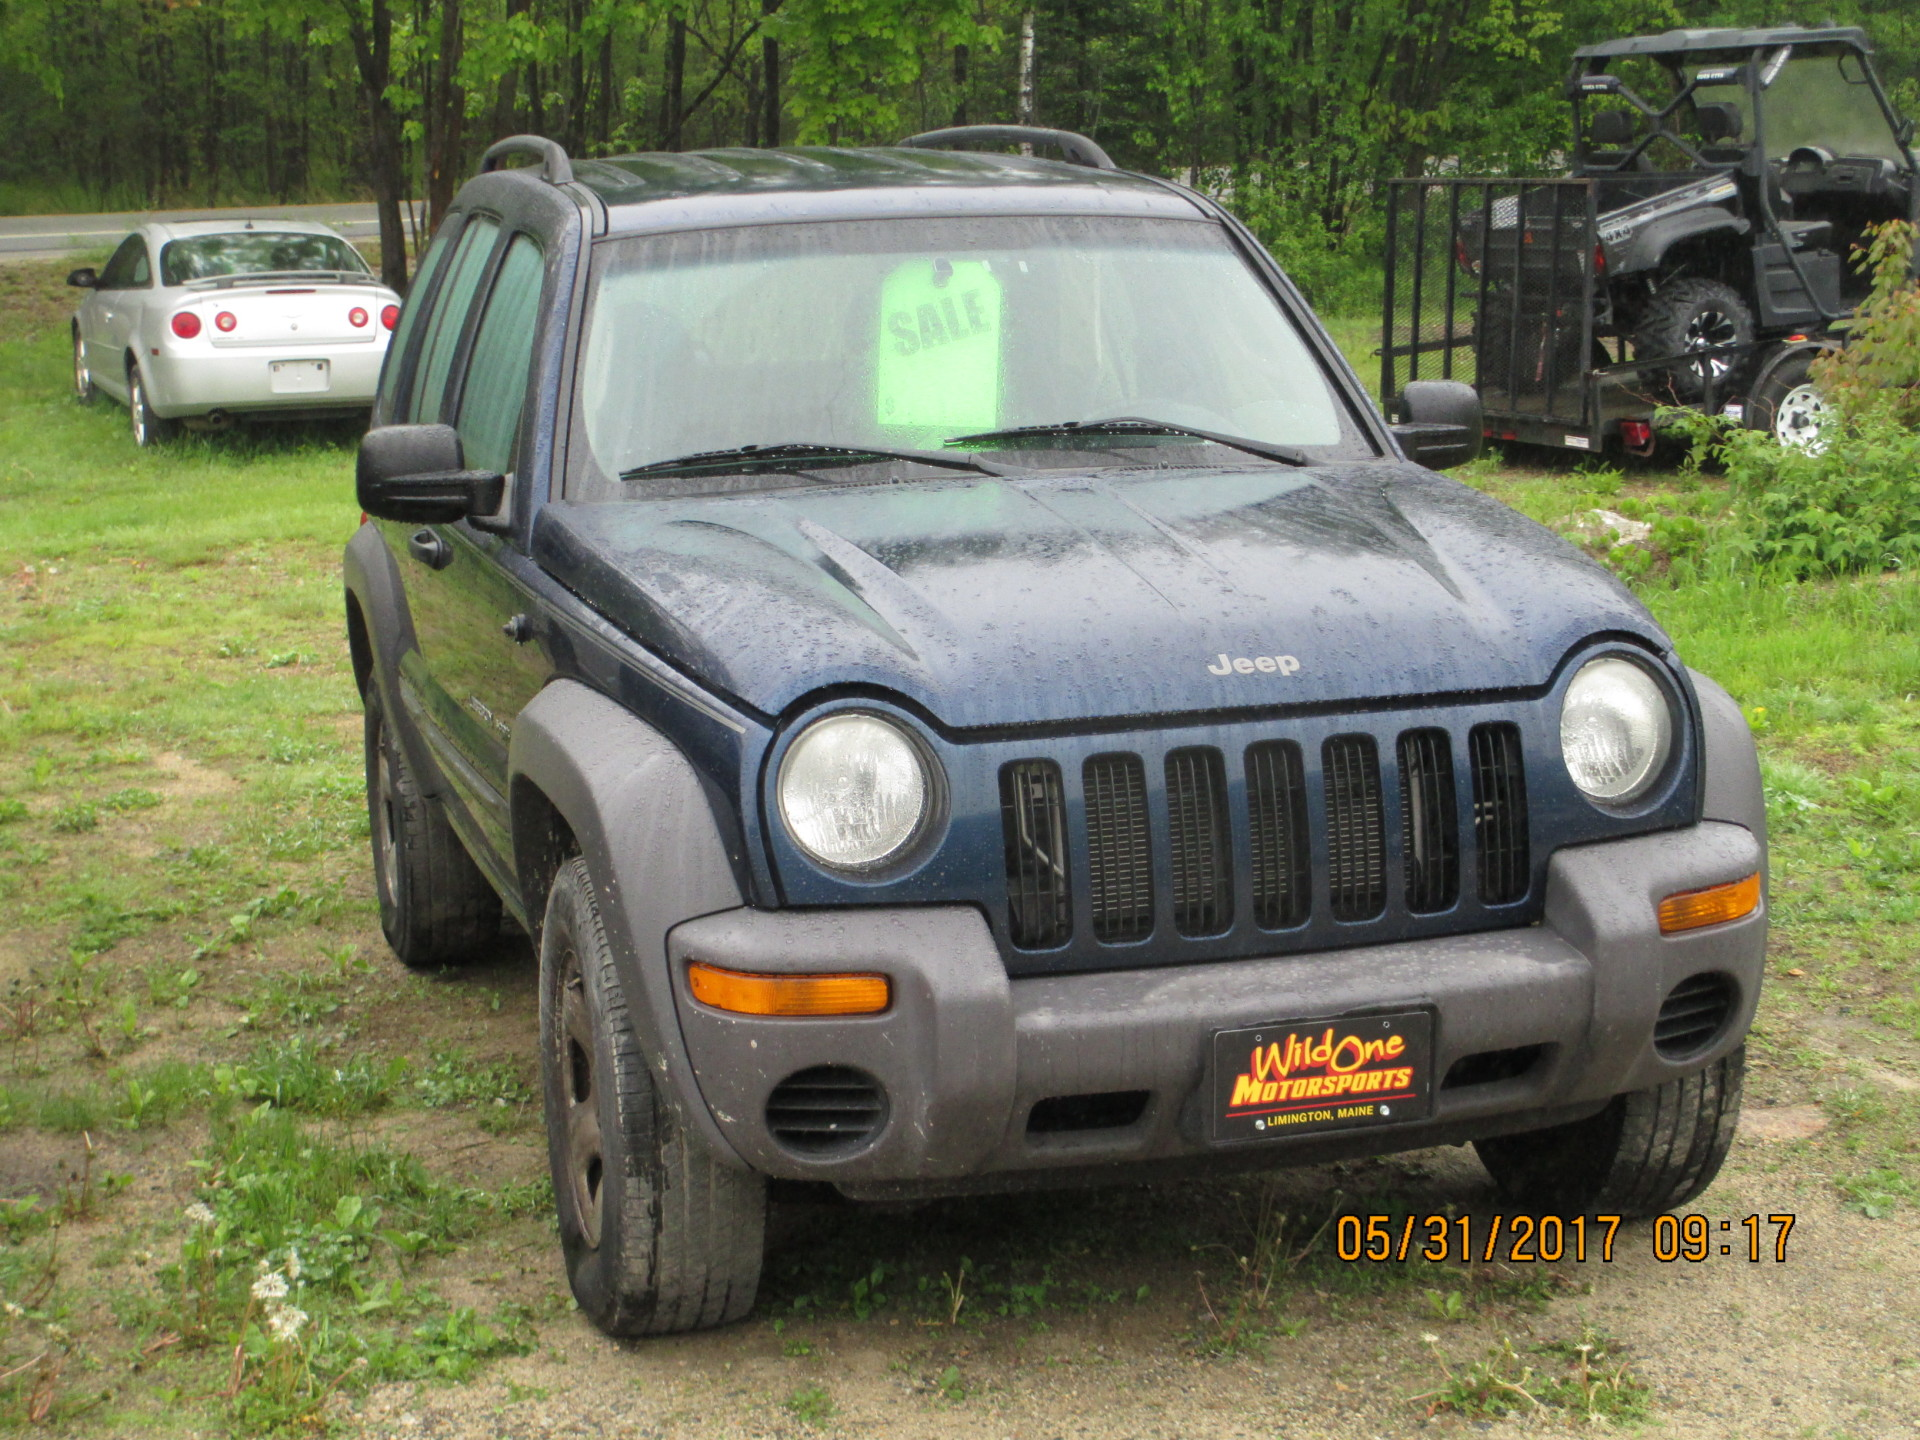 2003 Jeep Liberty Sport - Blue